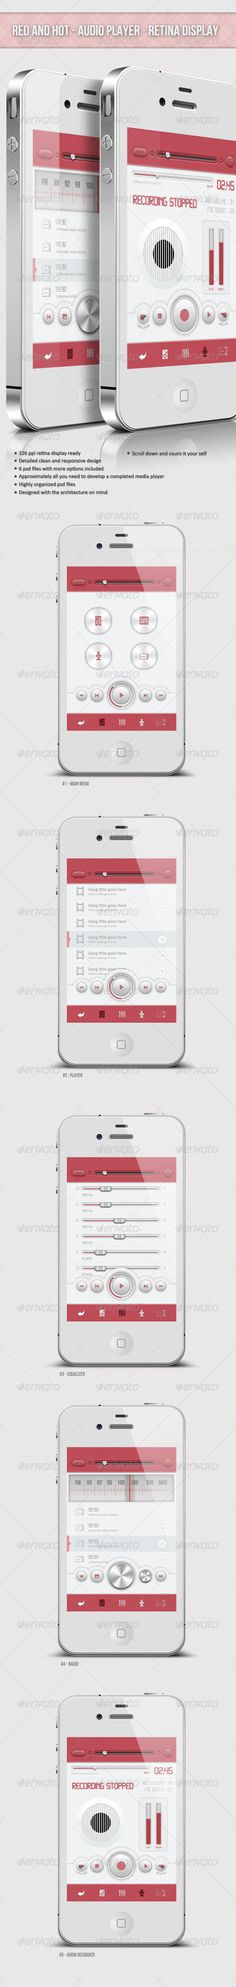 Red And Hot - Retina Audio Player Ui - GraphicRiver Item for Sale #digitaldesign #design #app